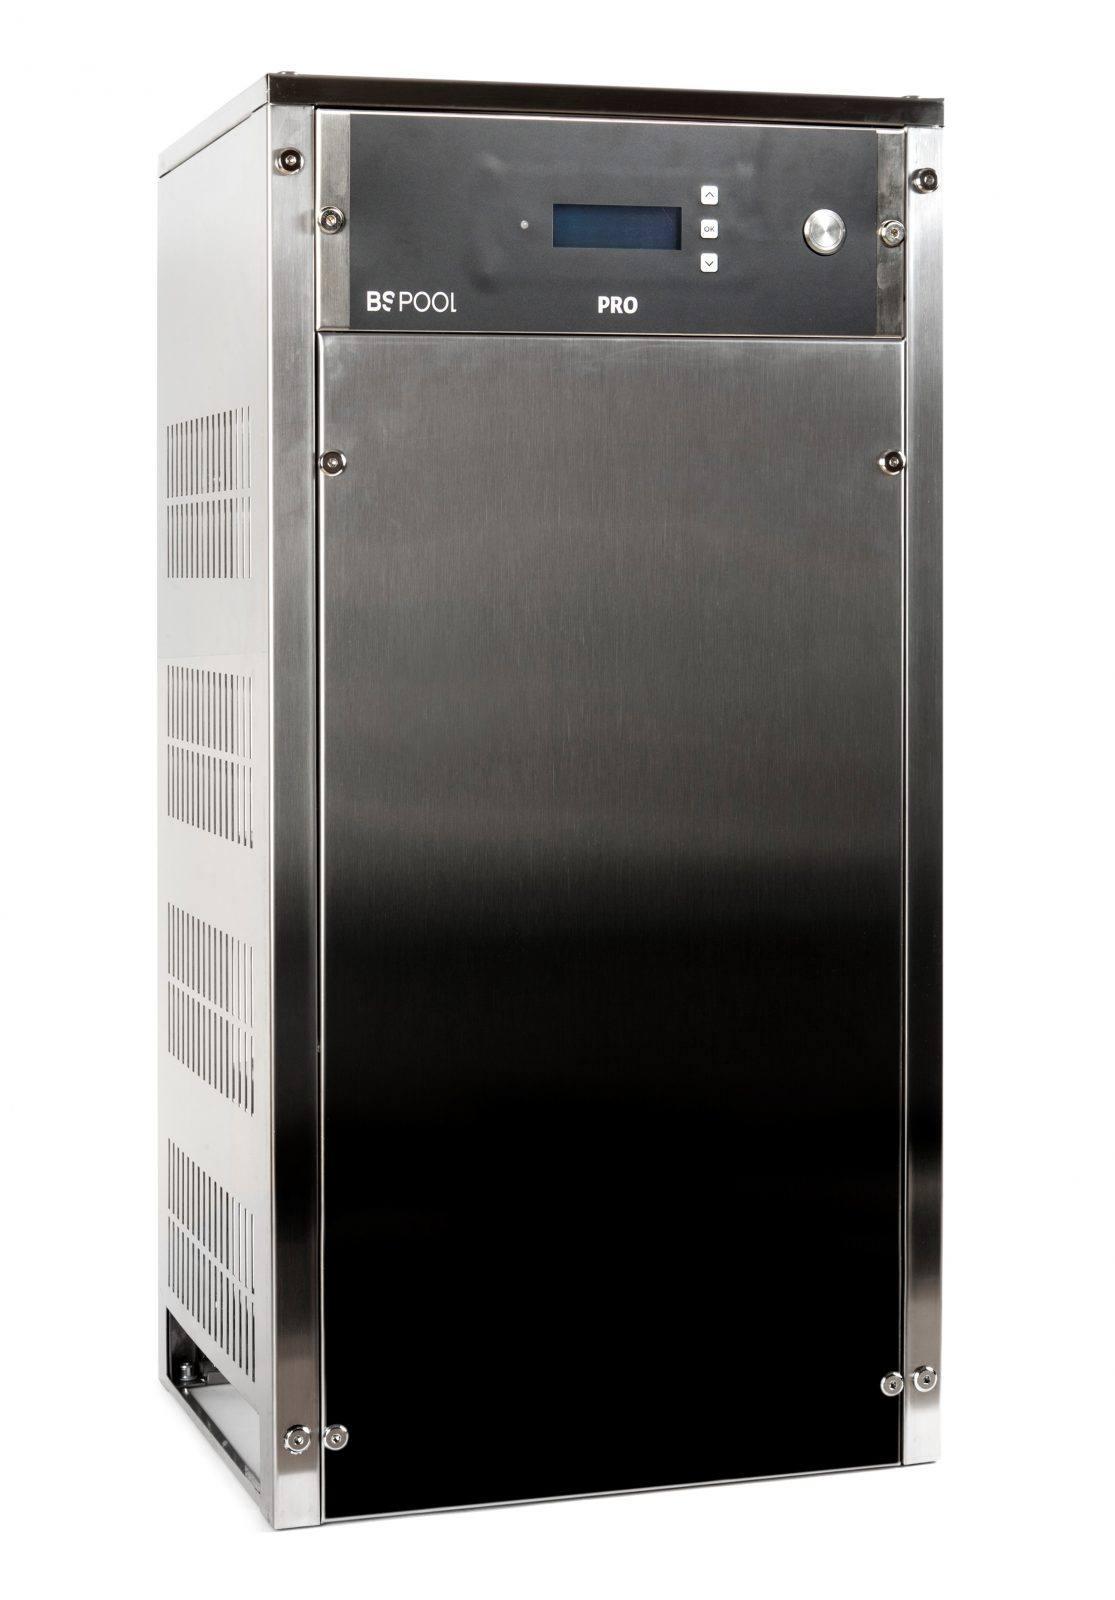 Clorador industrial BSPOOL PRO 250-1000